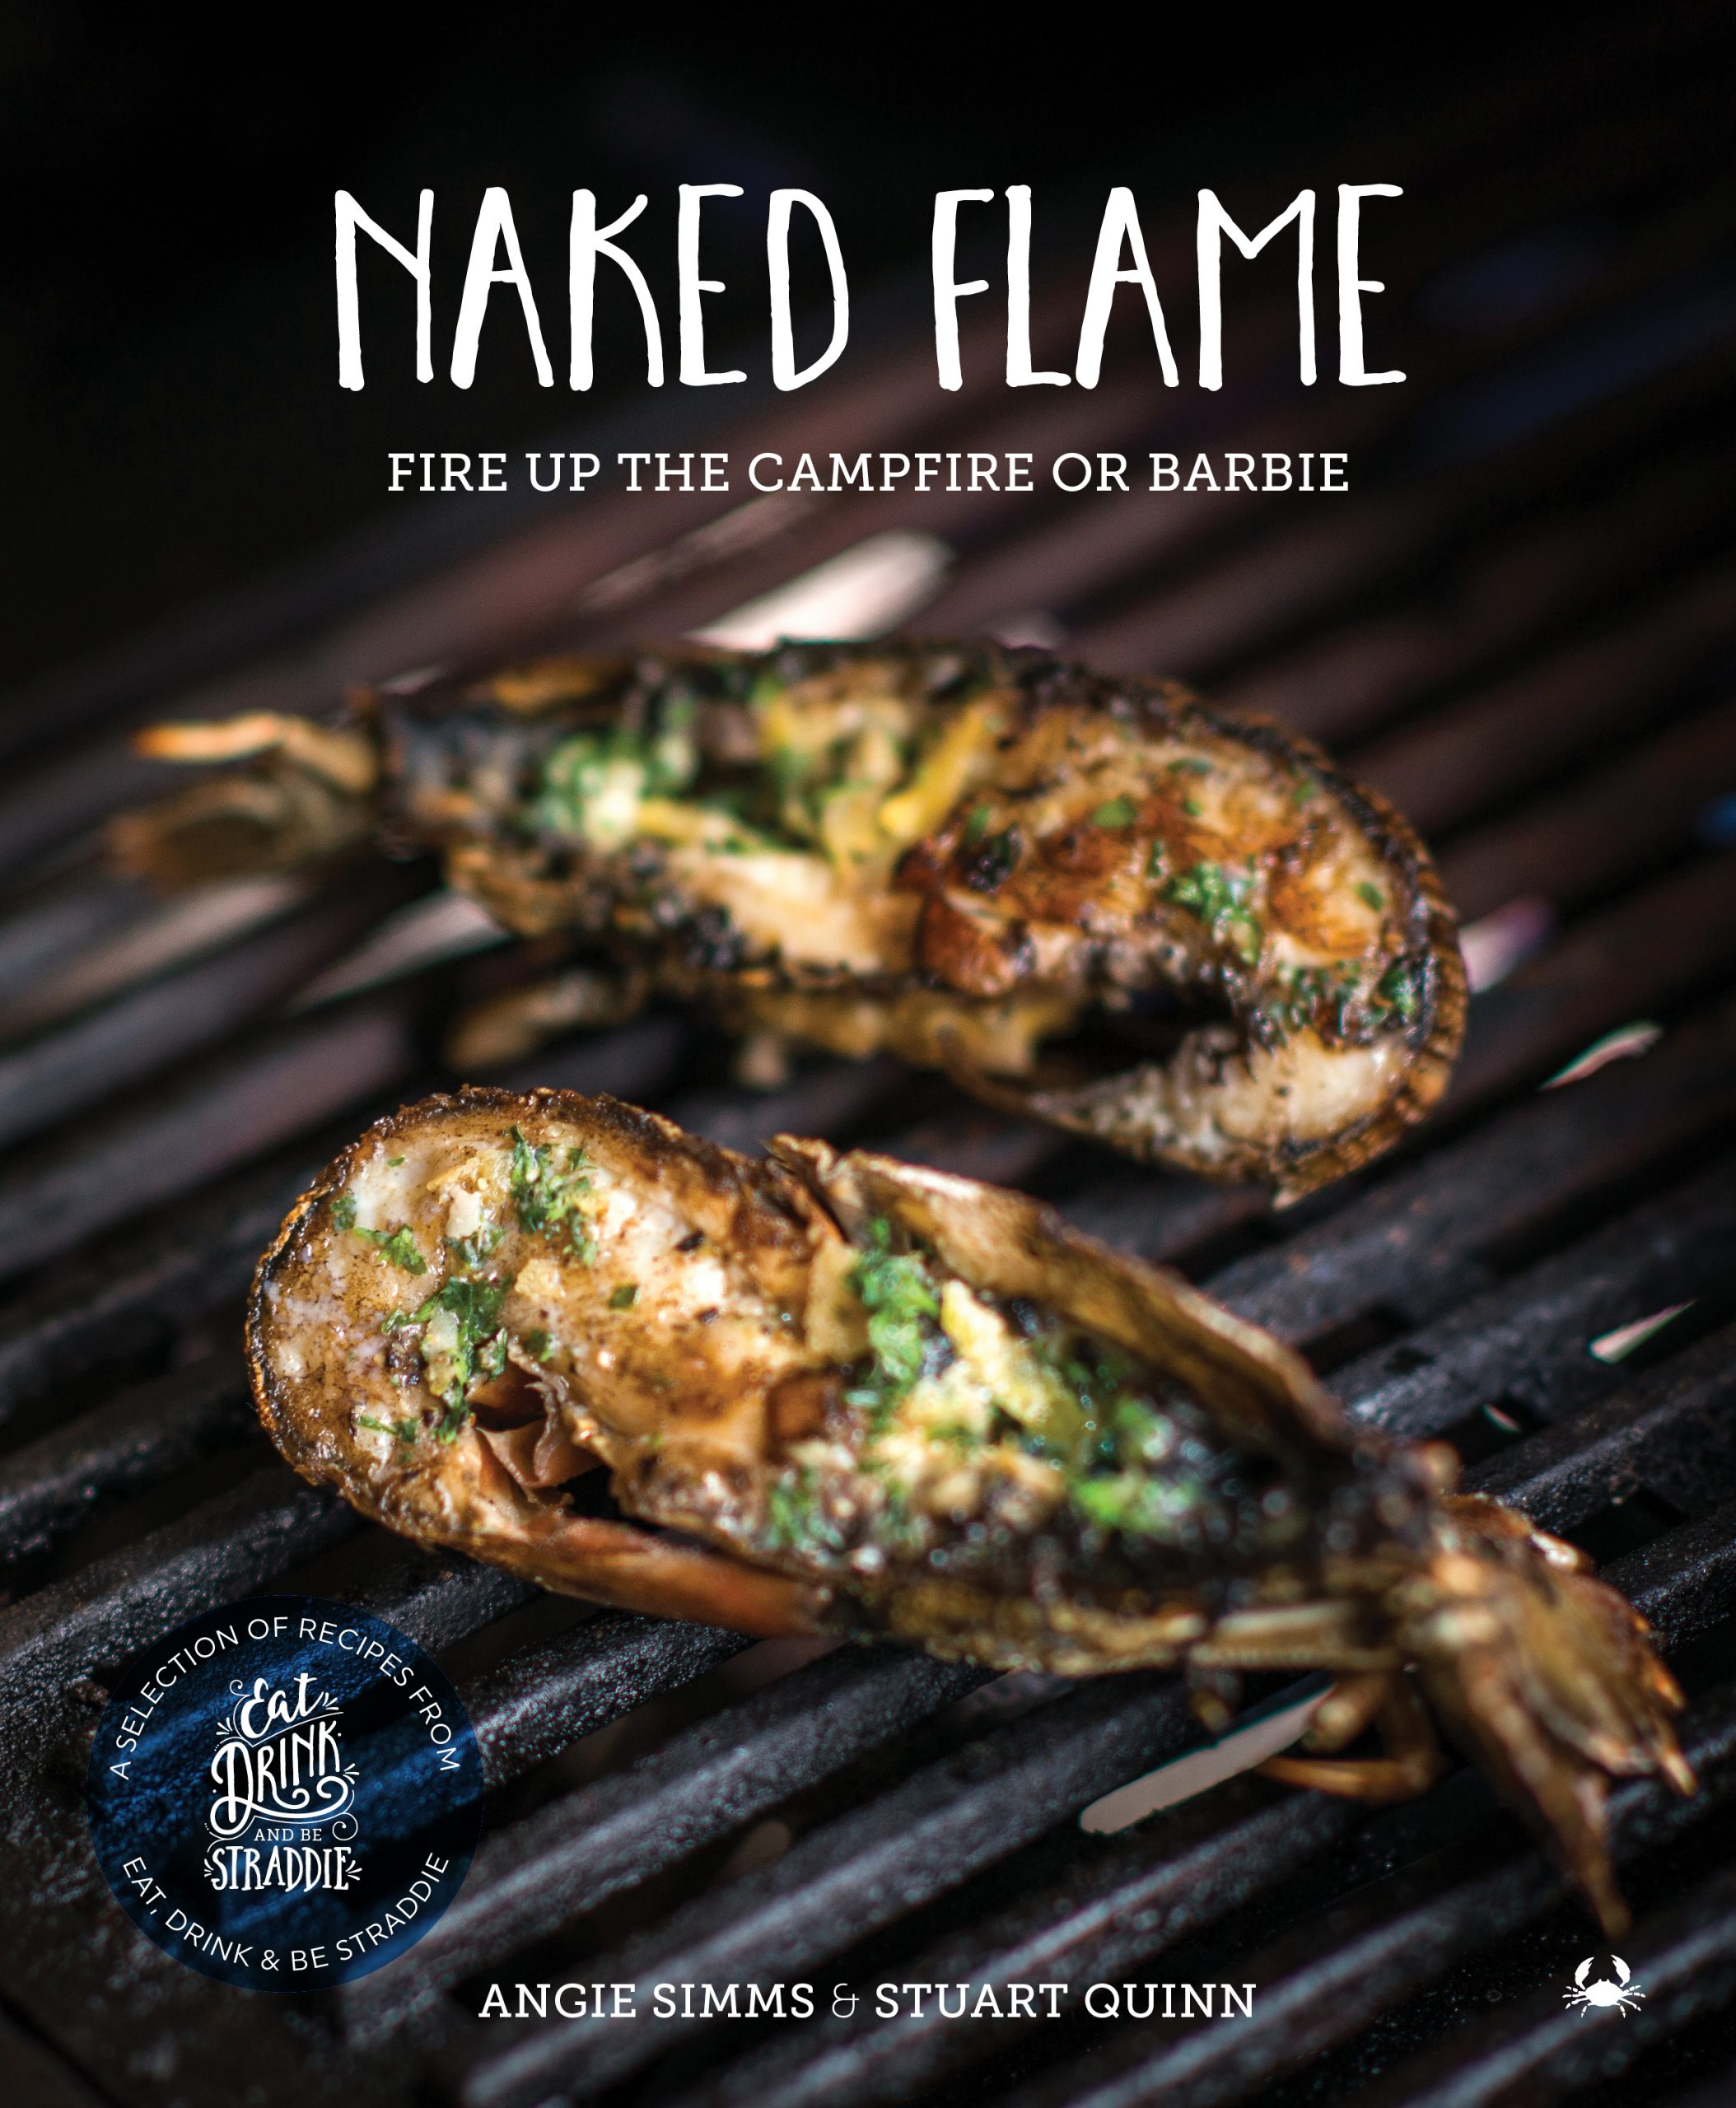 Naked Flame | Eat Drink and Be Starddie | ebook | stradbroke Island Photography